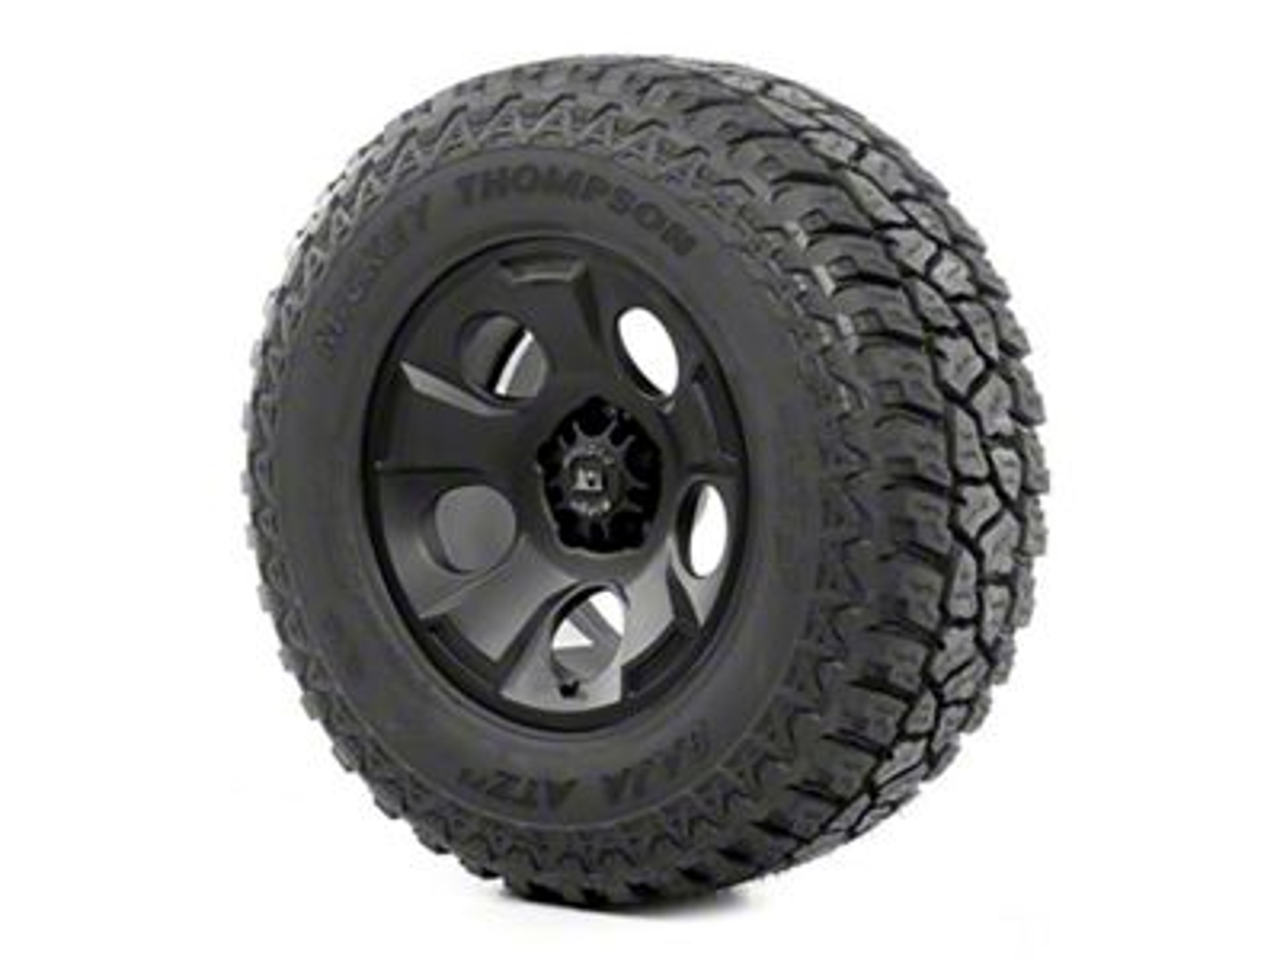 Rugged Ridge Drakon Wheel 17x9 Black Satin and Mickey Thompson ATZ P3 315/70R17 Tire (07-18 Jeep Wrangler JK)